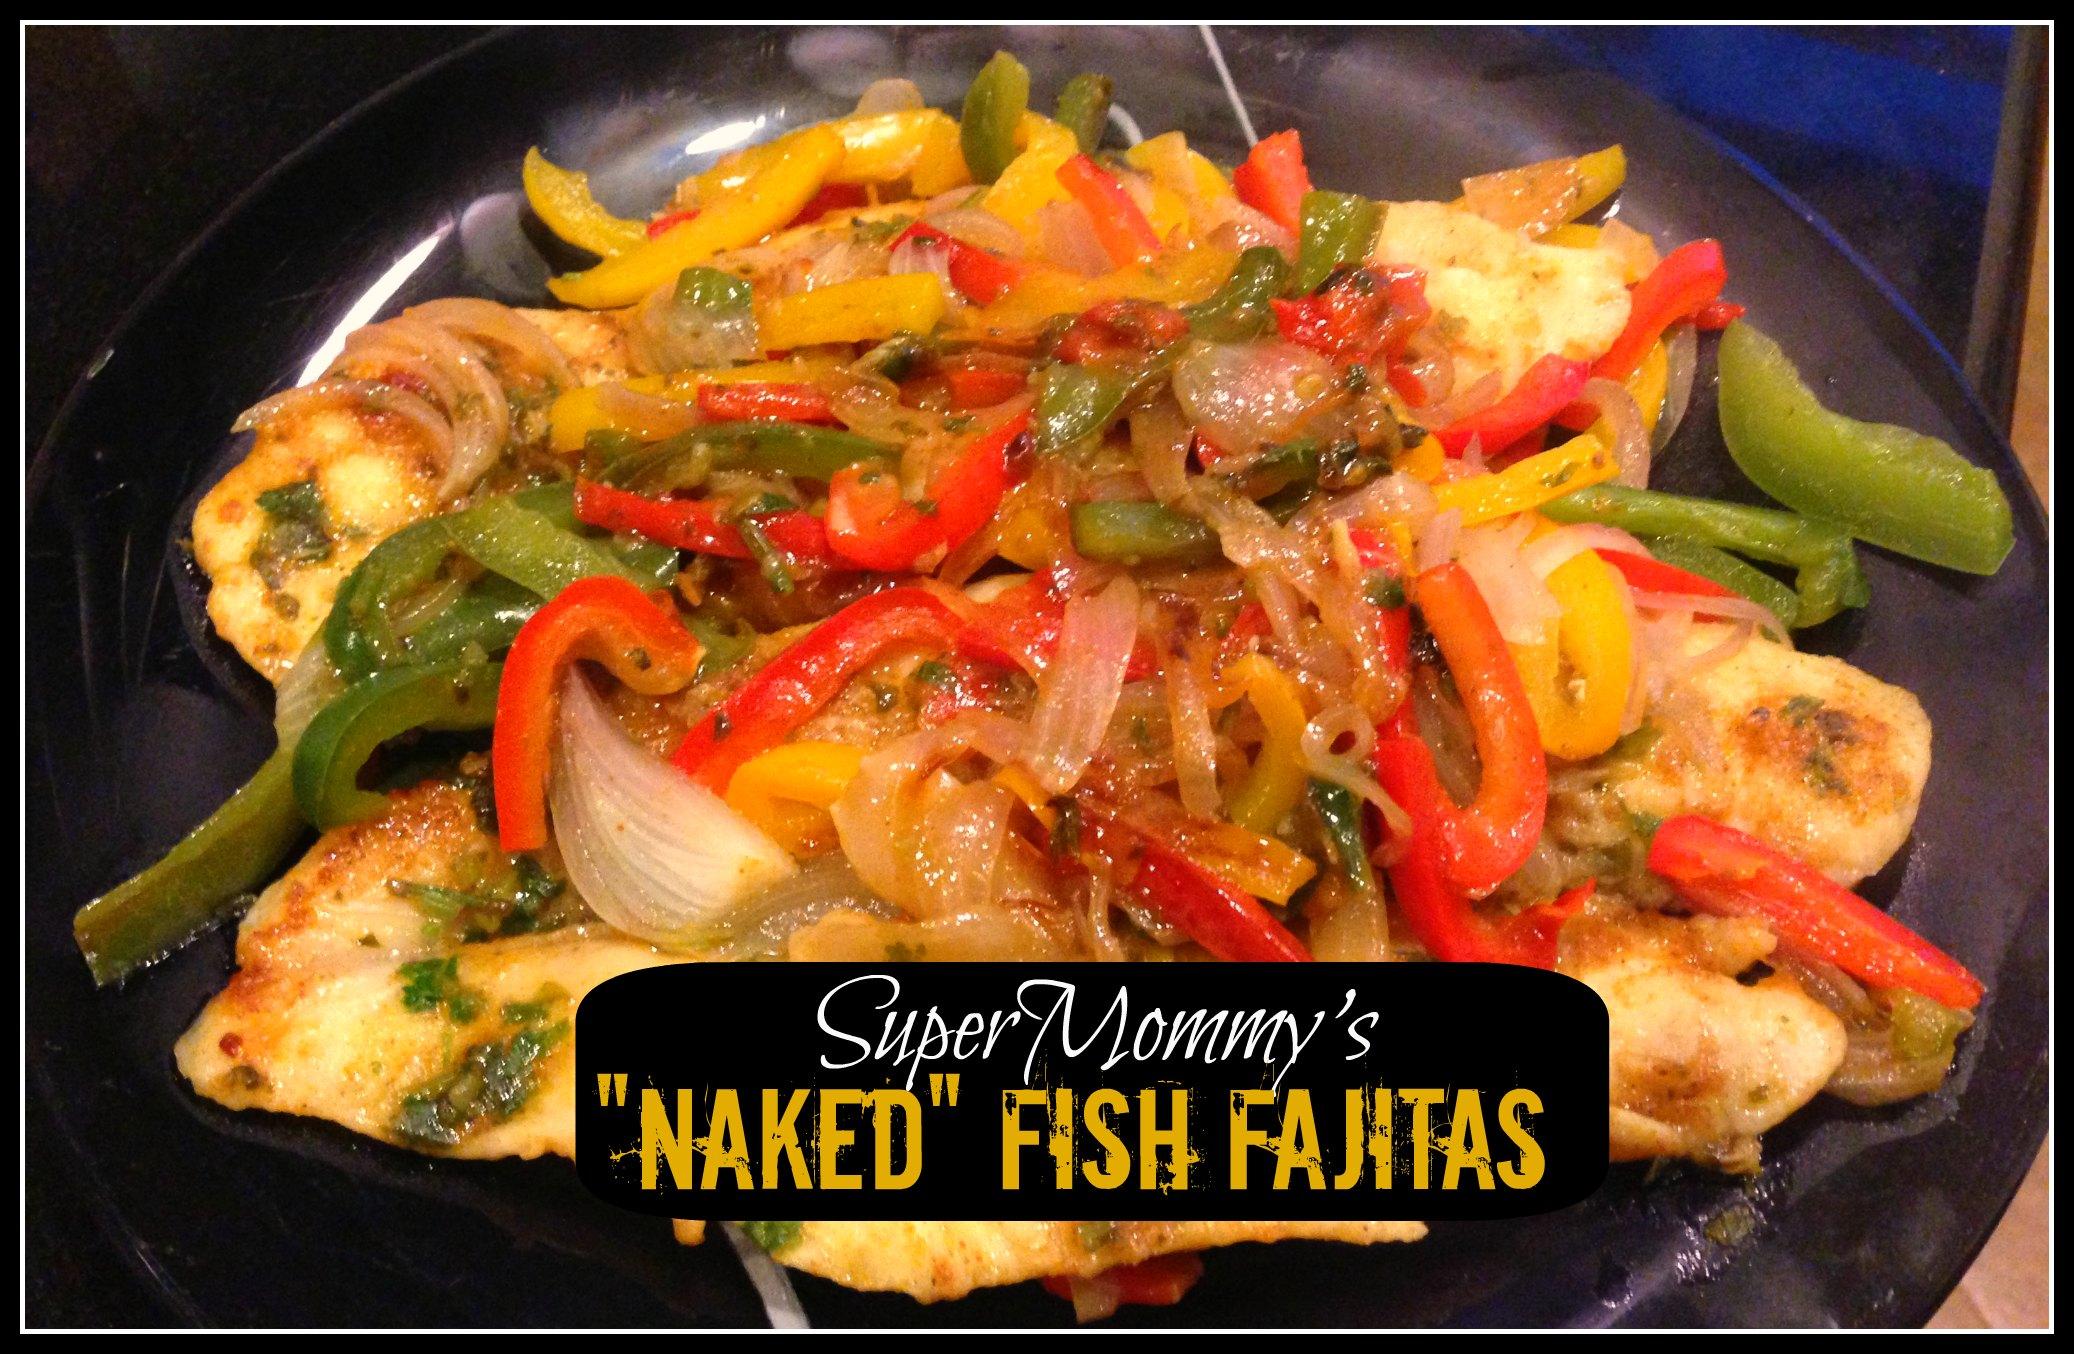 Naked Fish Fajitas